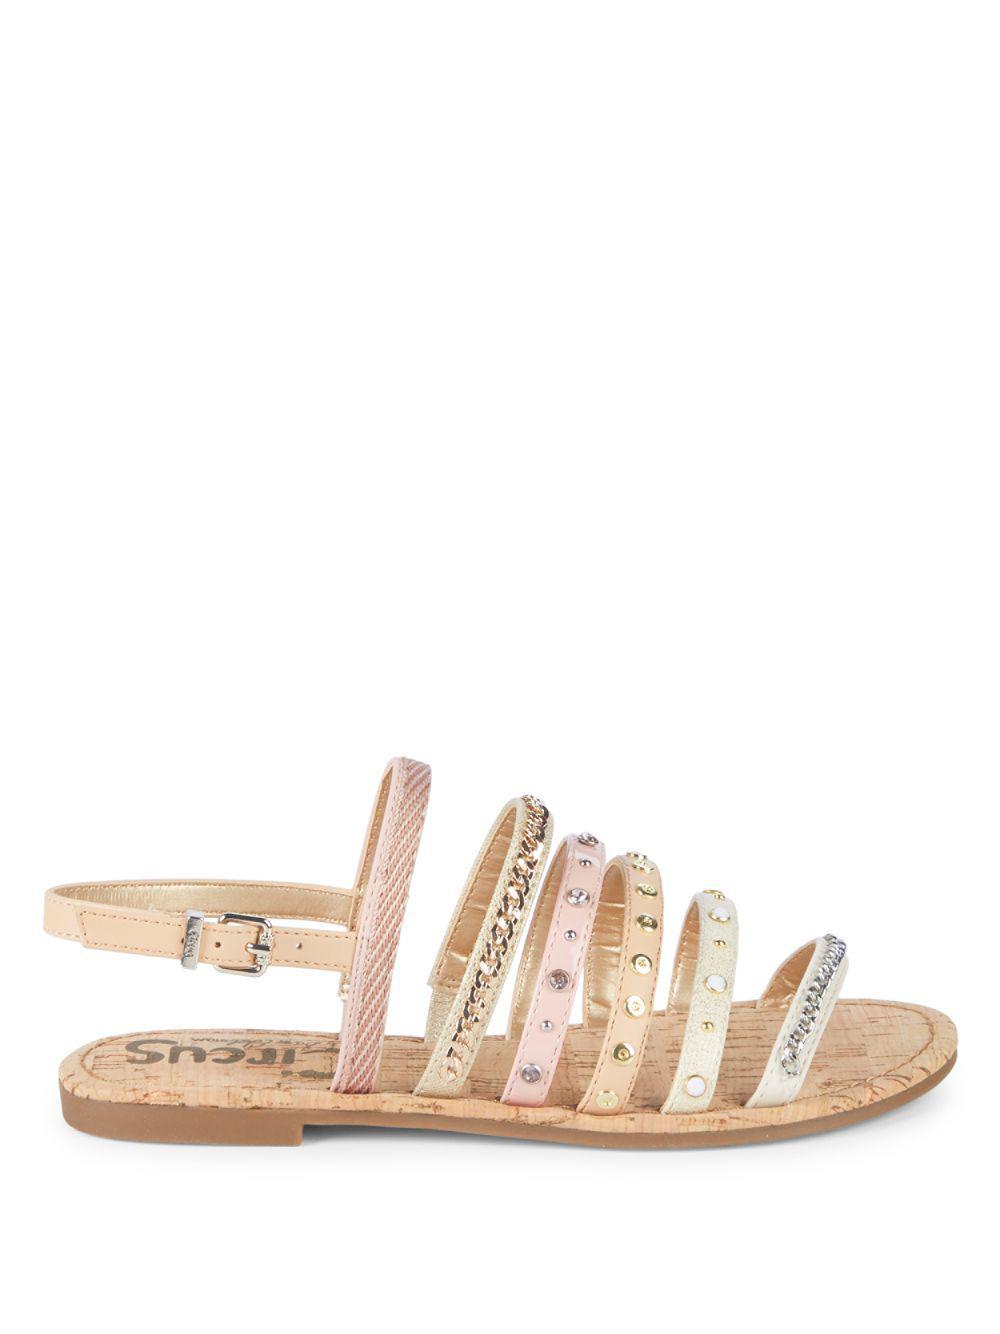 12bb7c0eb9a56d Lyst - Circus by Sam Edelman Bev Strappy Flat Sandals in Metallic